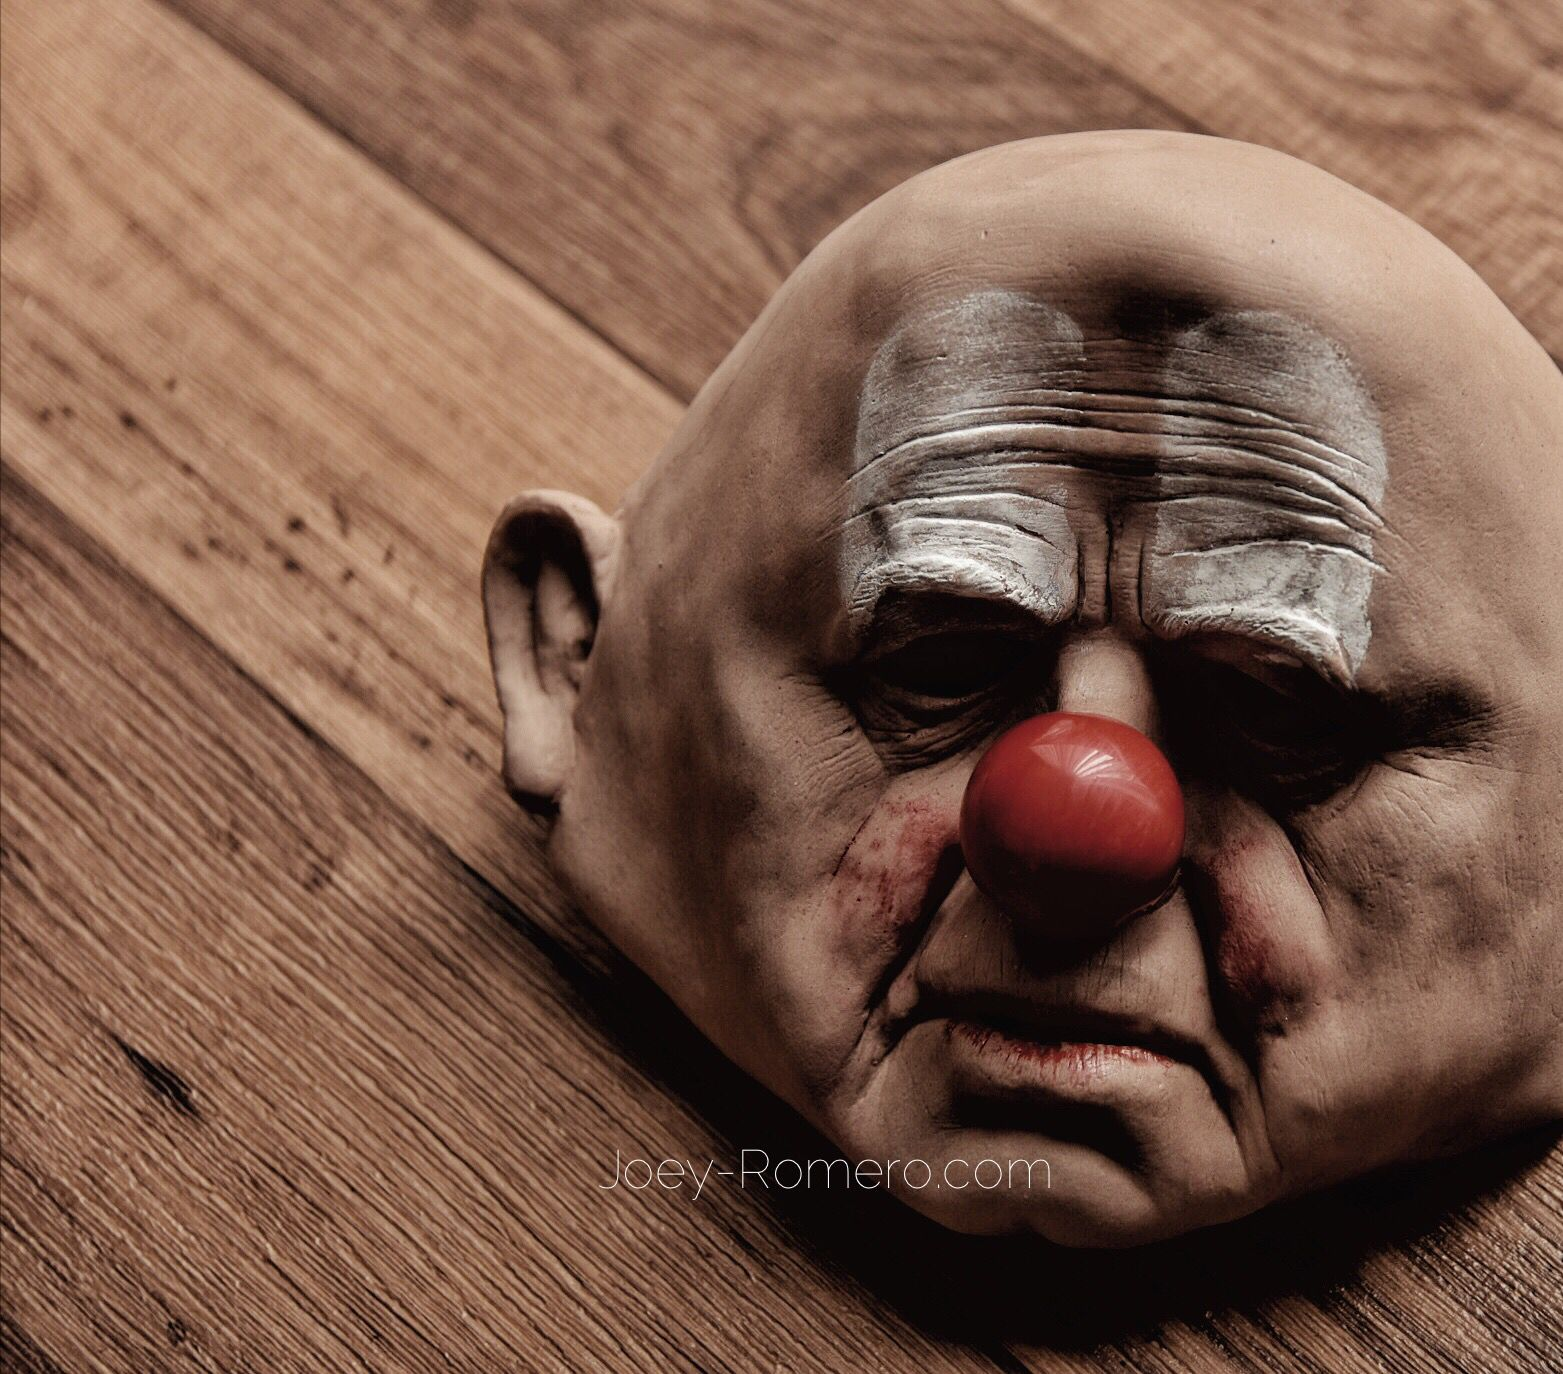 Clown Mask Vintage Halloween Mask | Joey Romero Photography ...